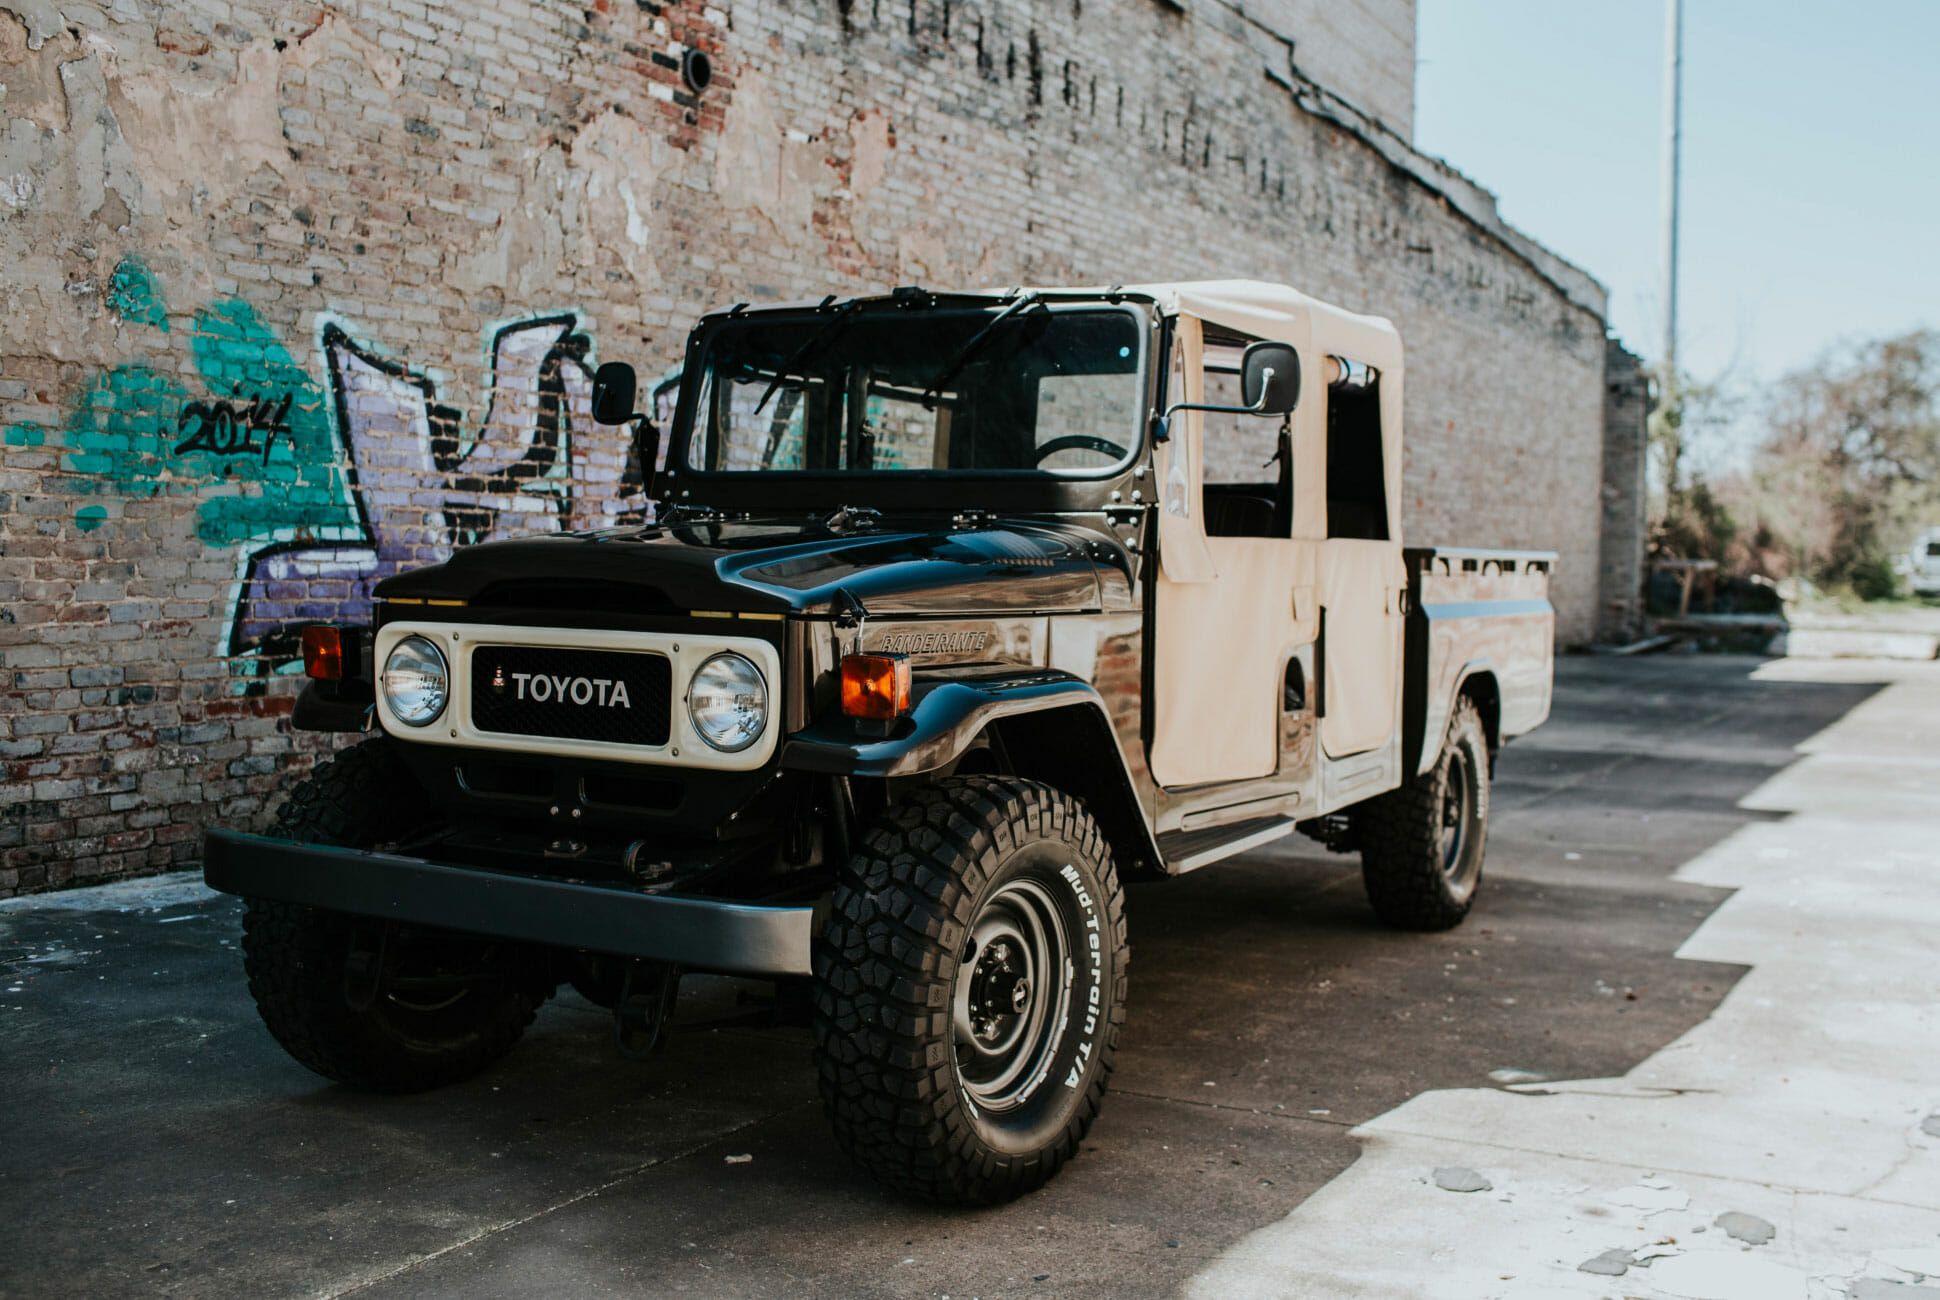 Toyota-Bandeirante-OJ55-gear-patrol-slide-02